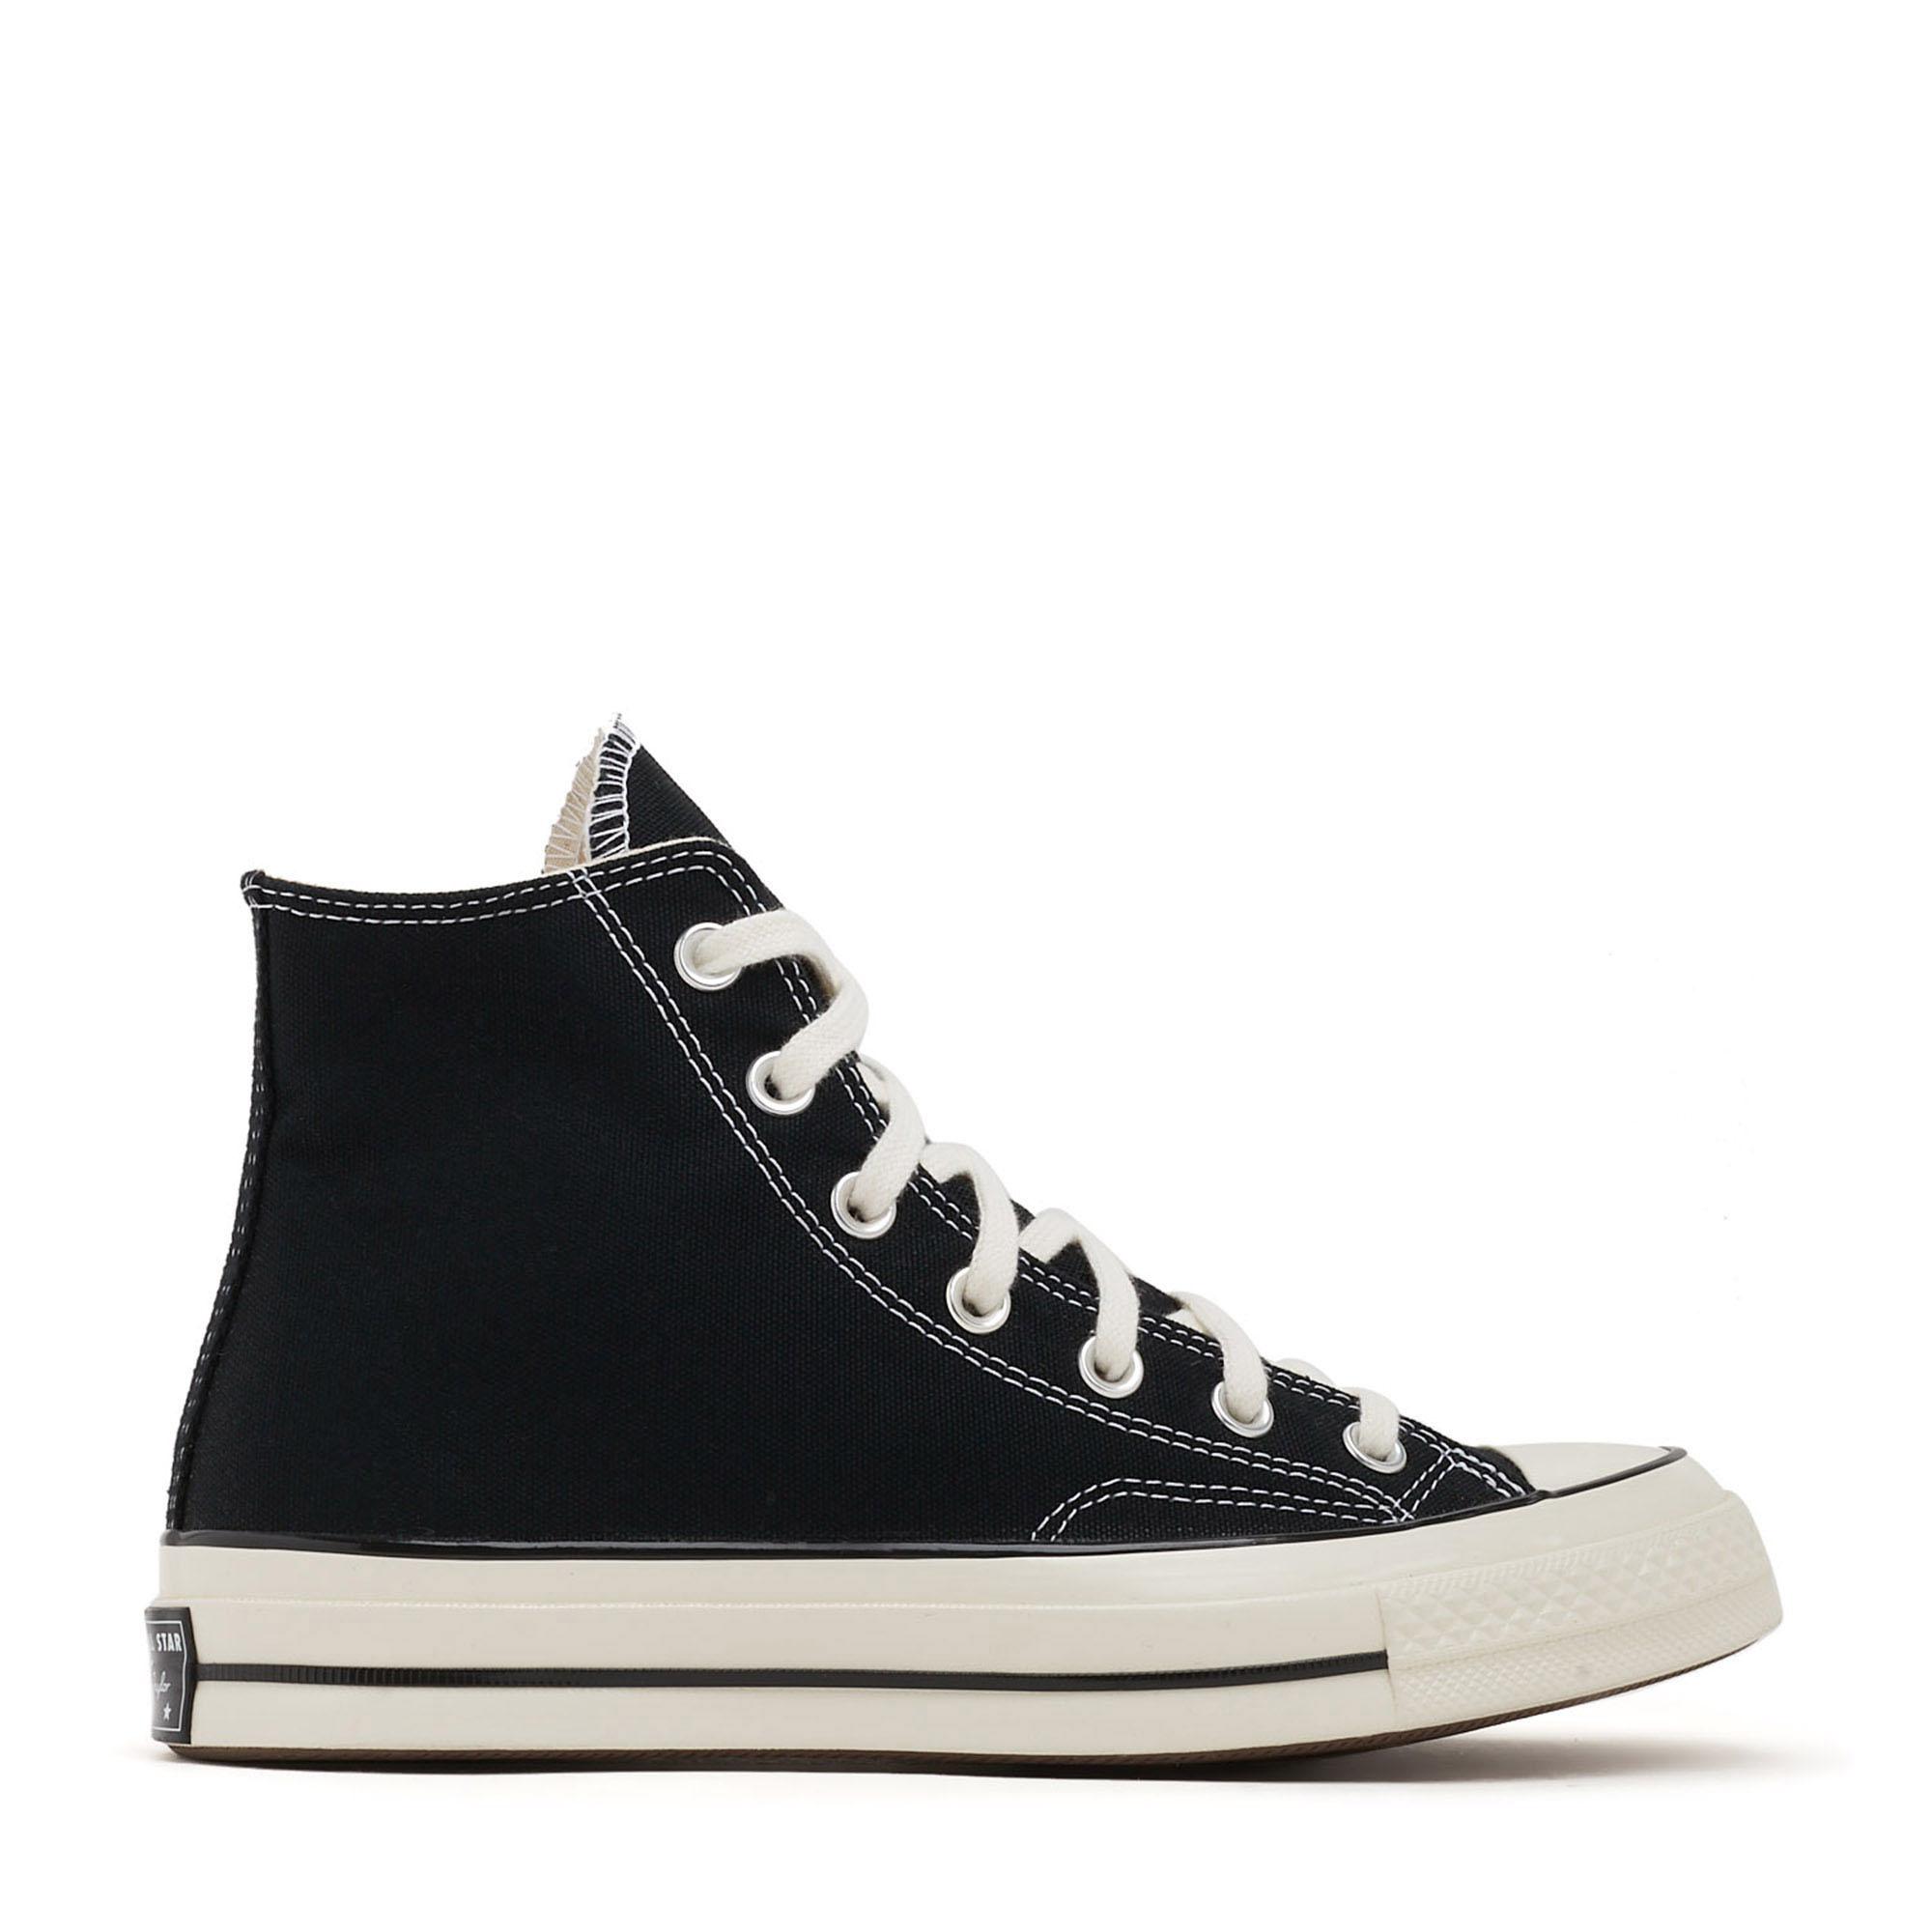 High top sneakers